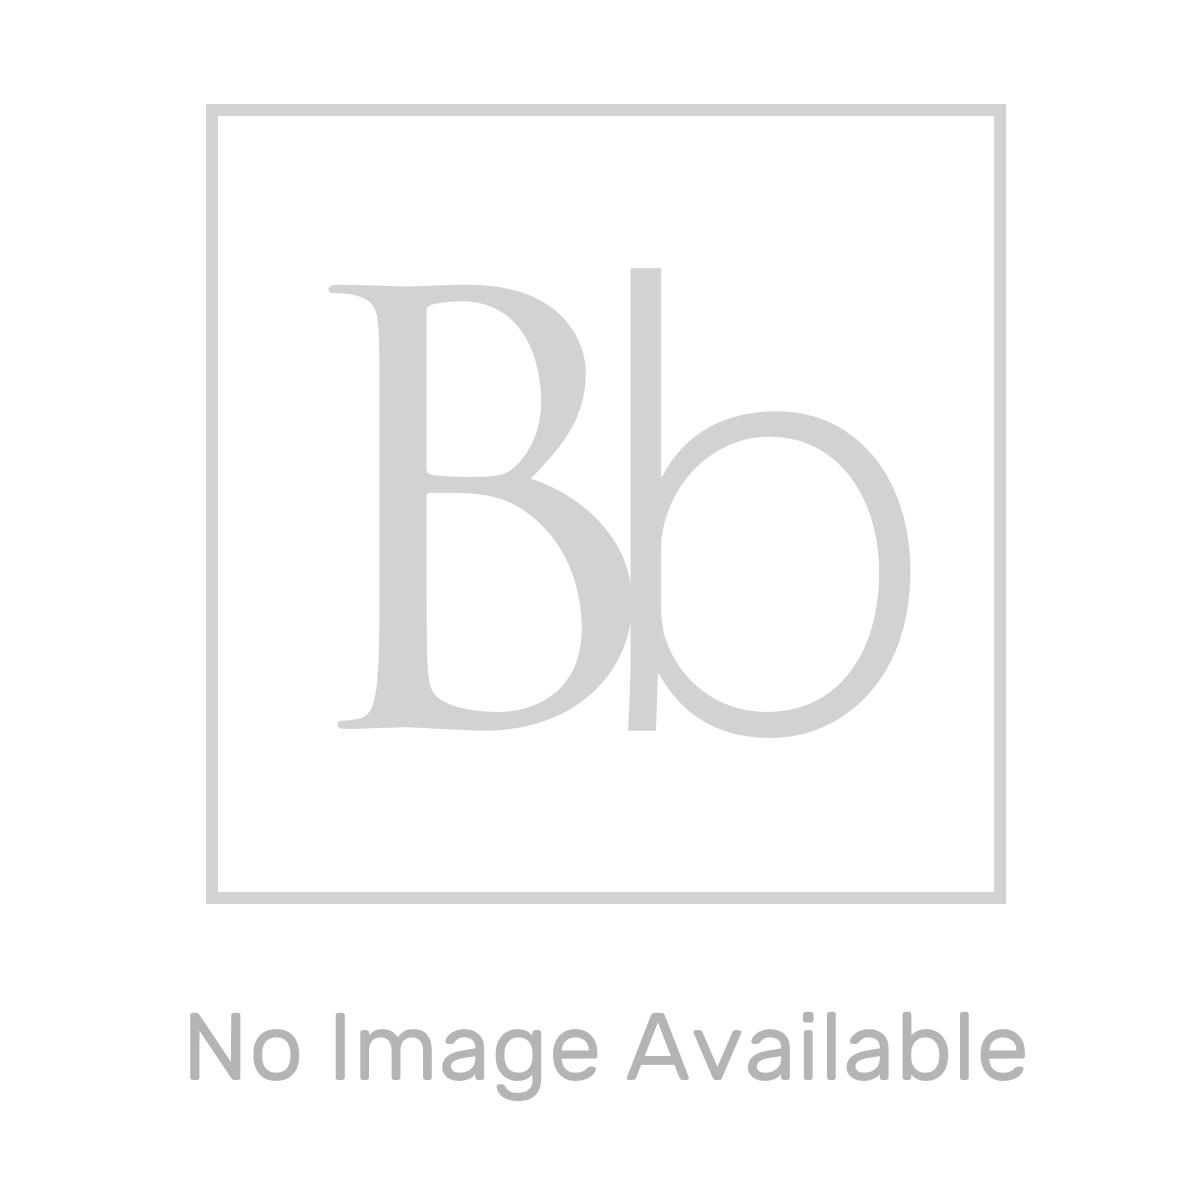 Frontline Aquaglass+ Frameless Sliding Shower Door with Optional Side Panel